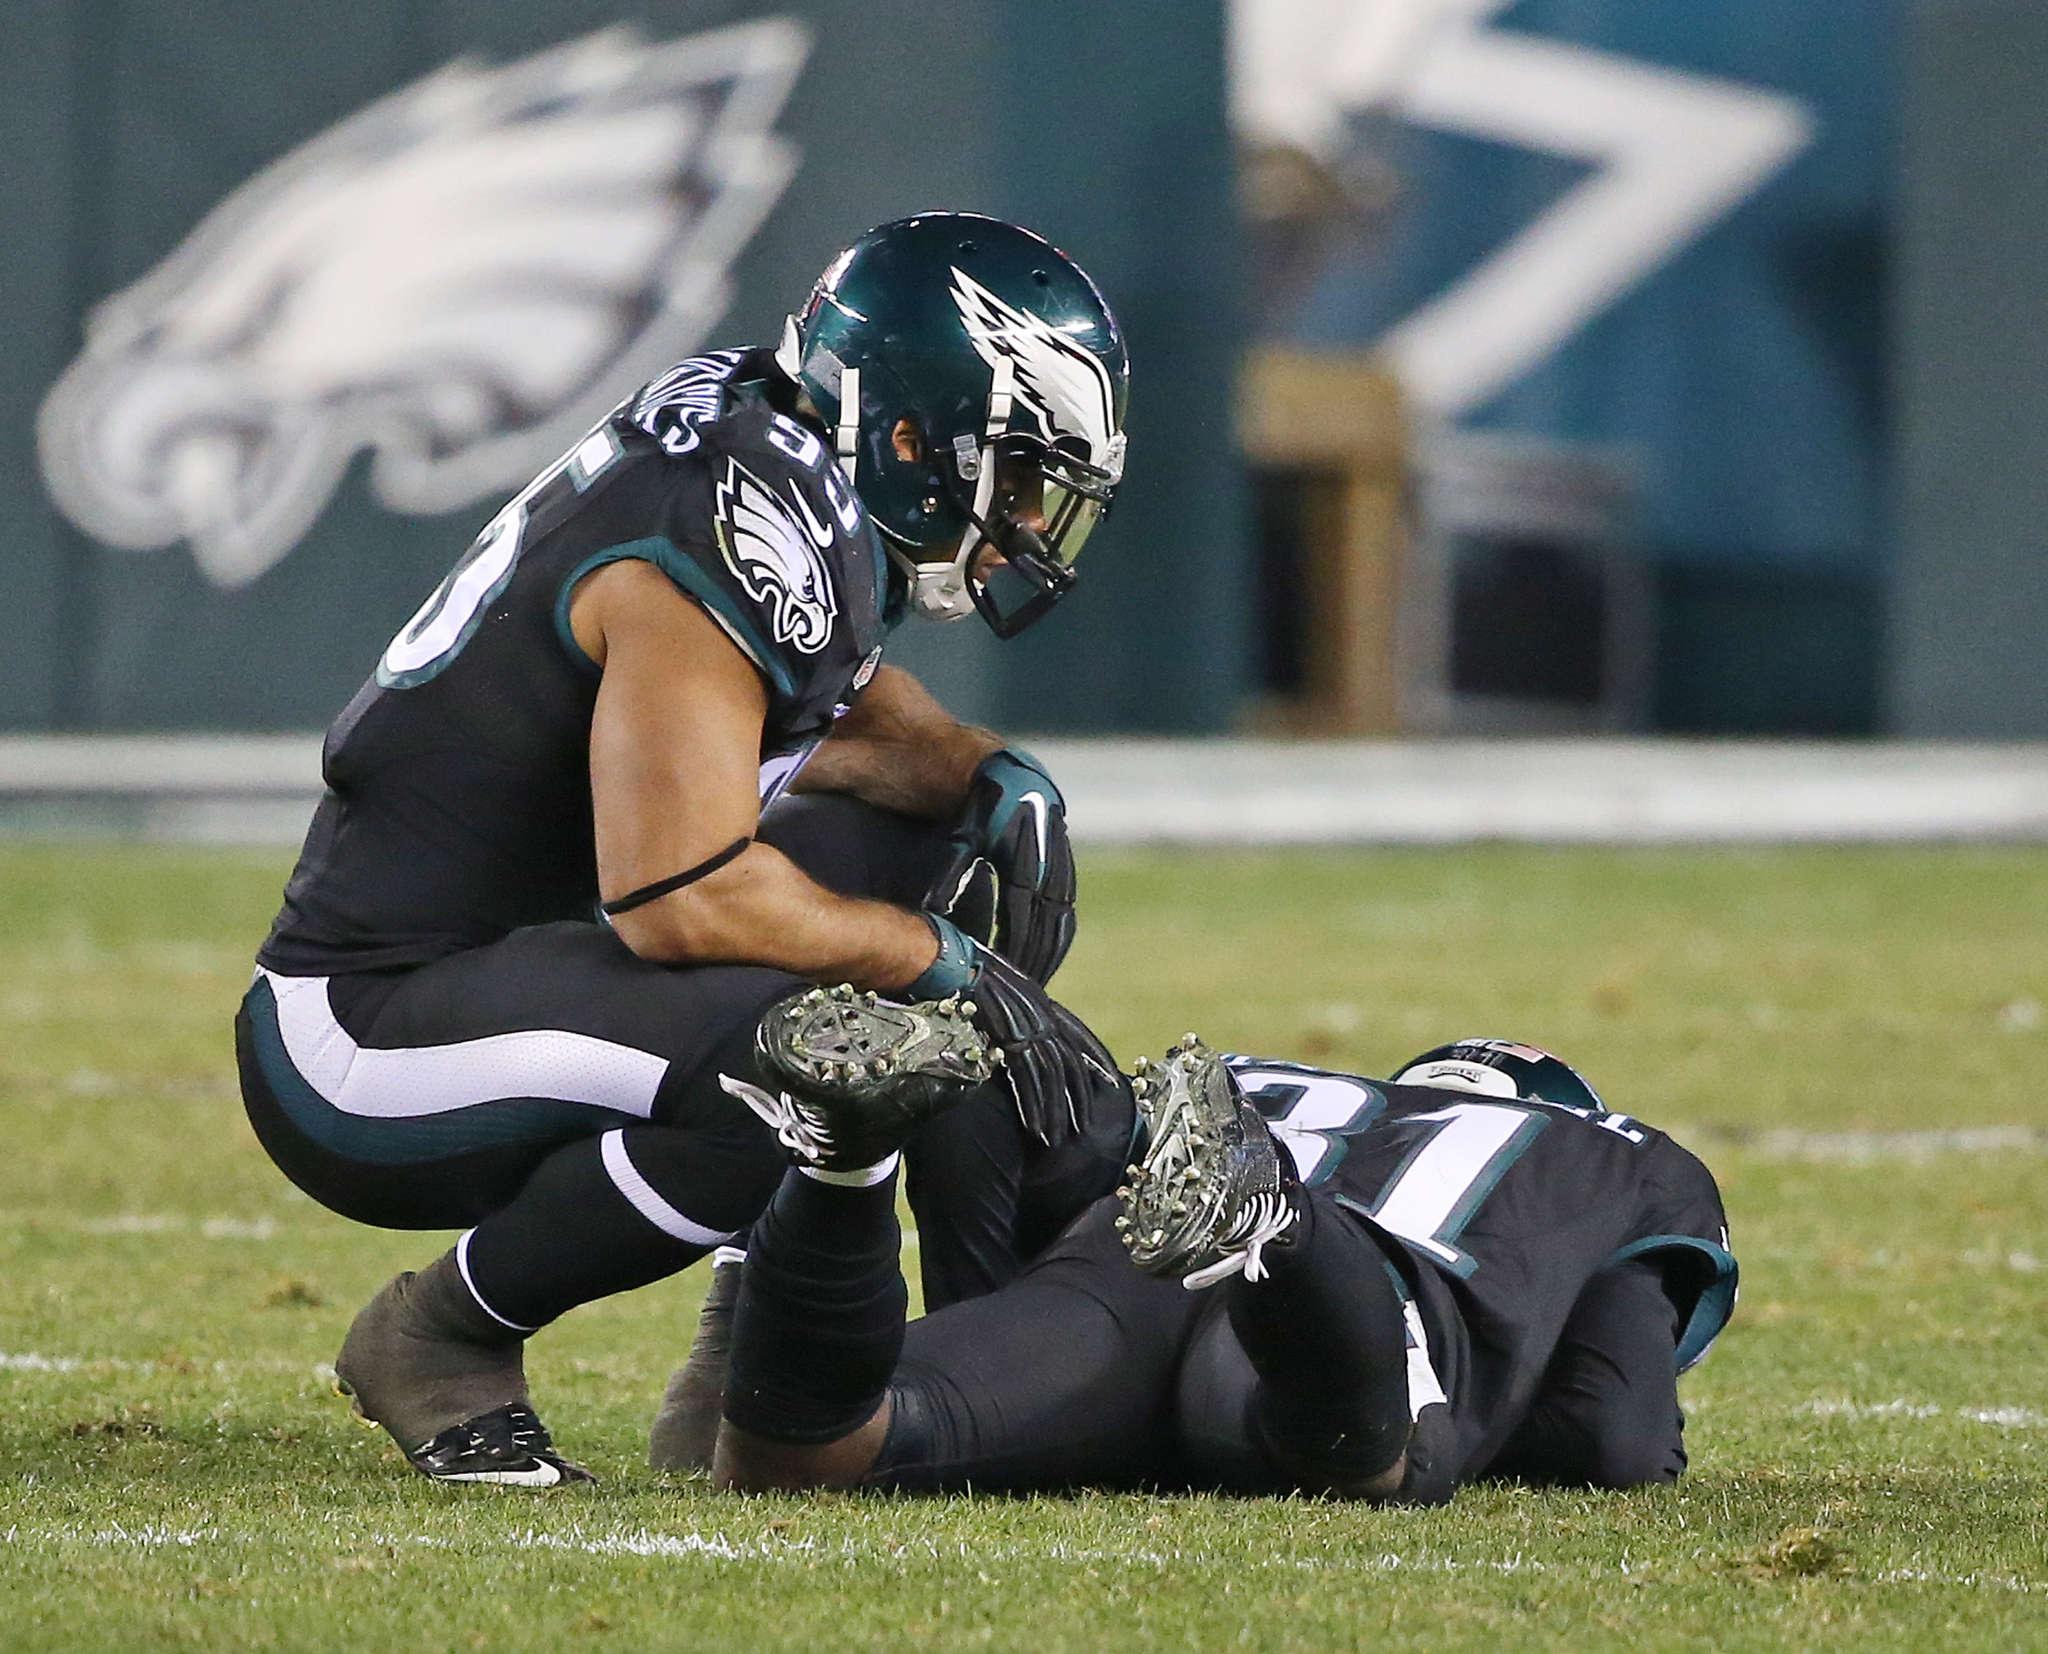 Eagles linebacker Mychal Kendricks checks on injured cornerback Byron Maxwell. DAVID MAIALETTI /STAFF PHOTOGRAPHER